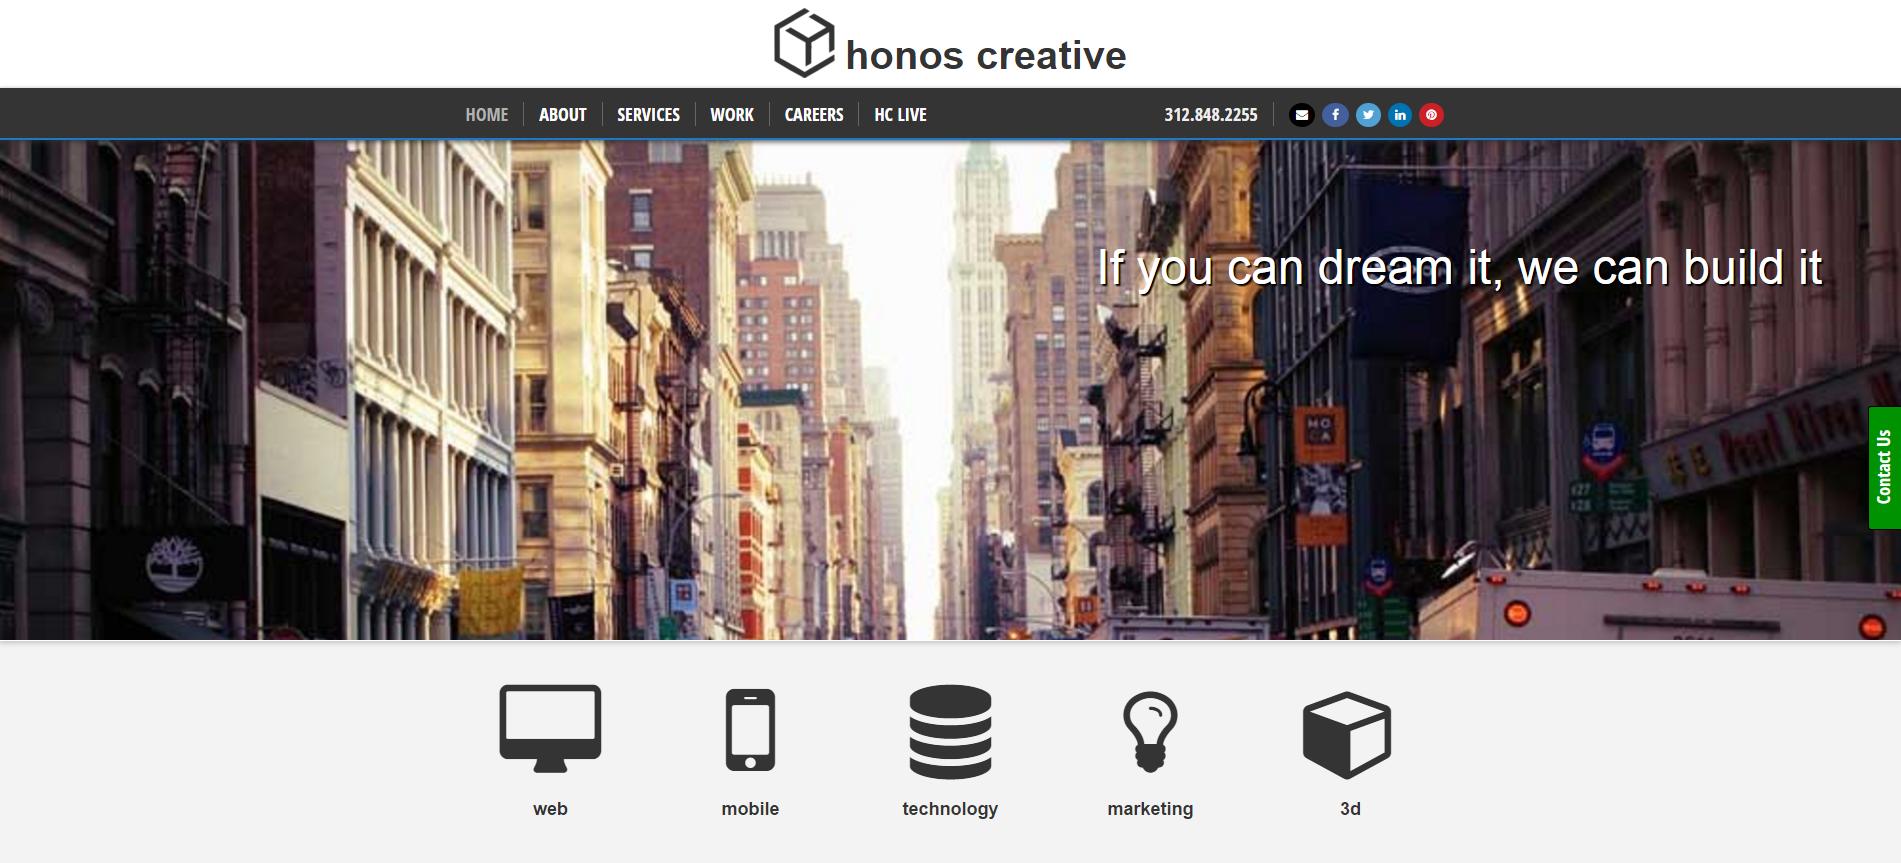 Honos Creative